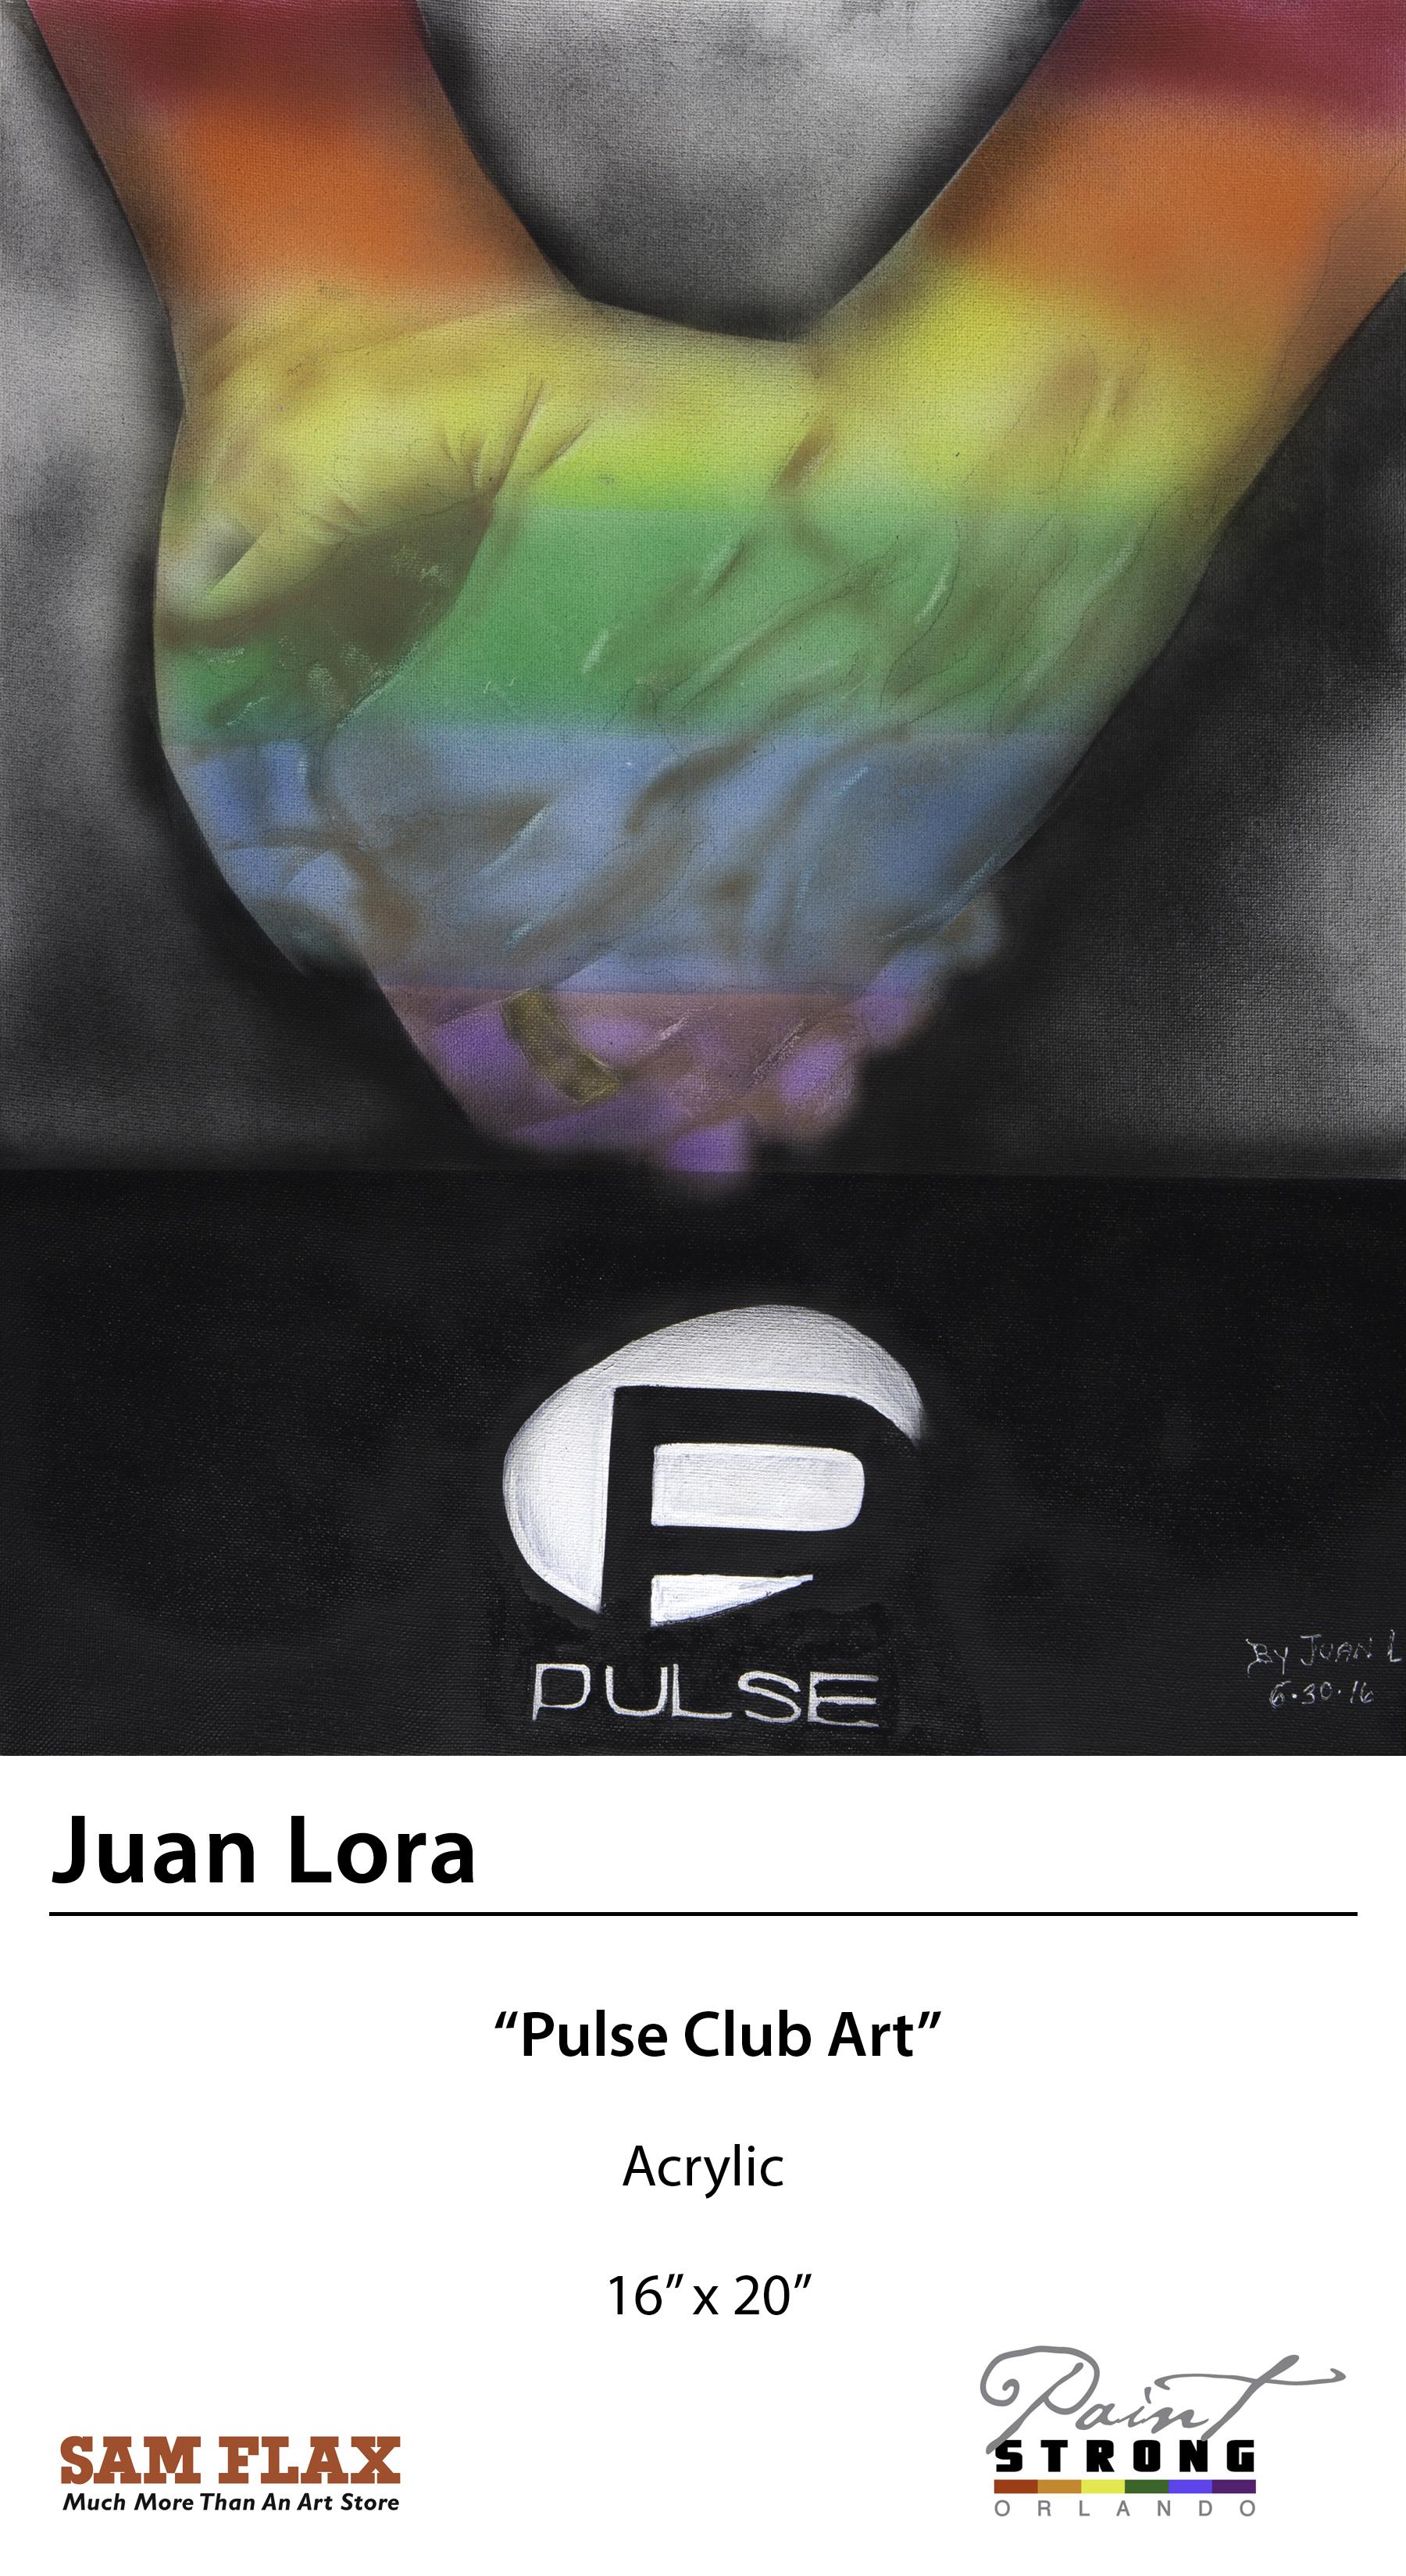 Juan Lora